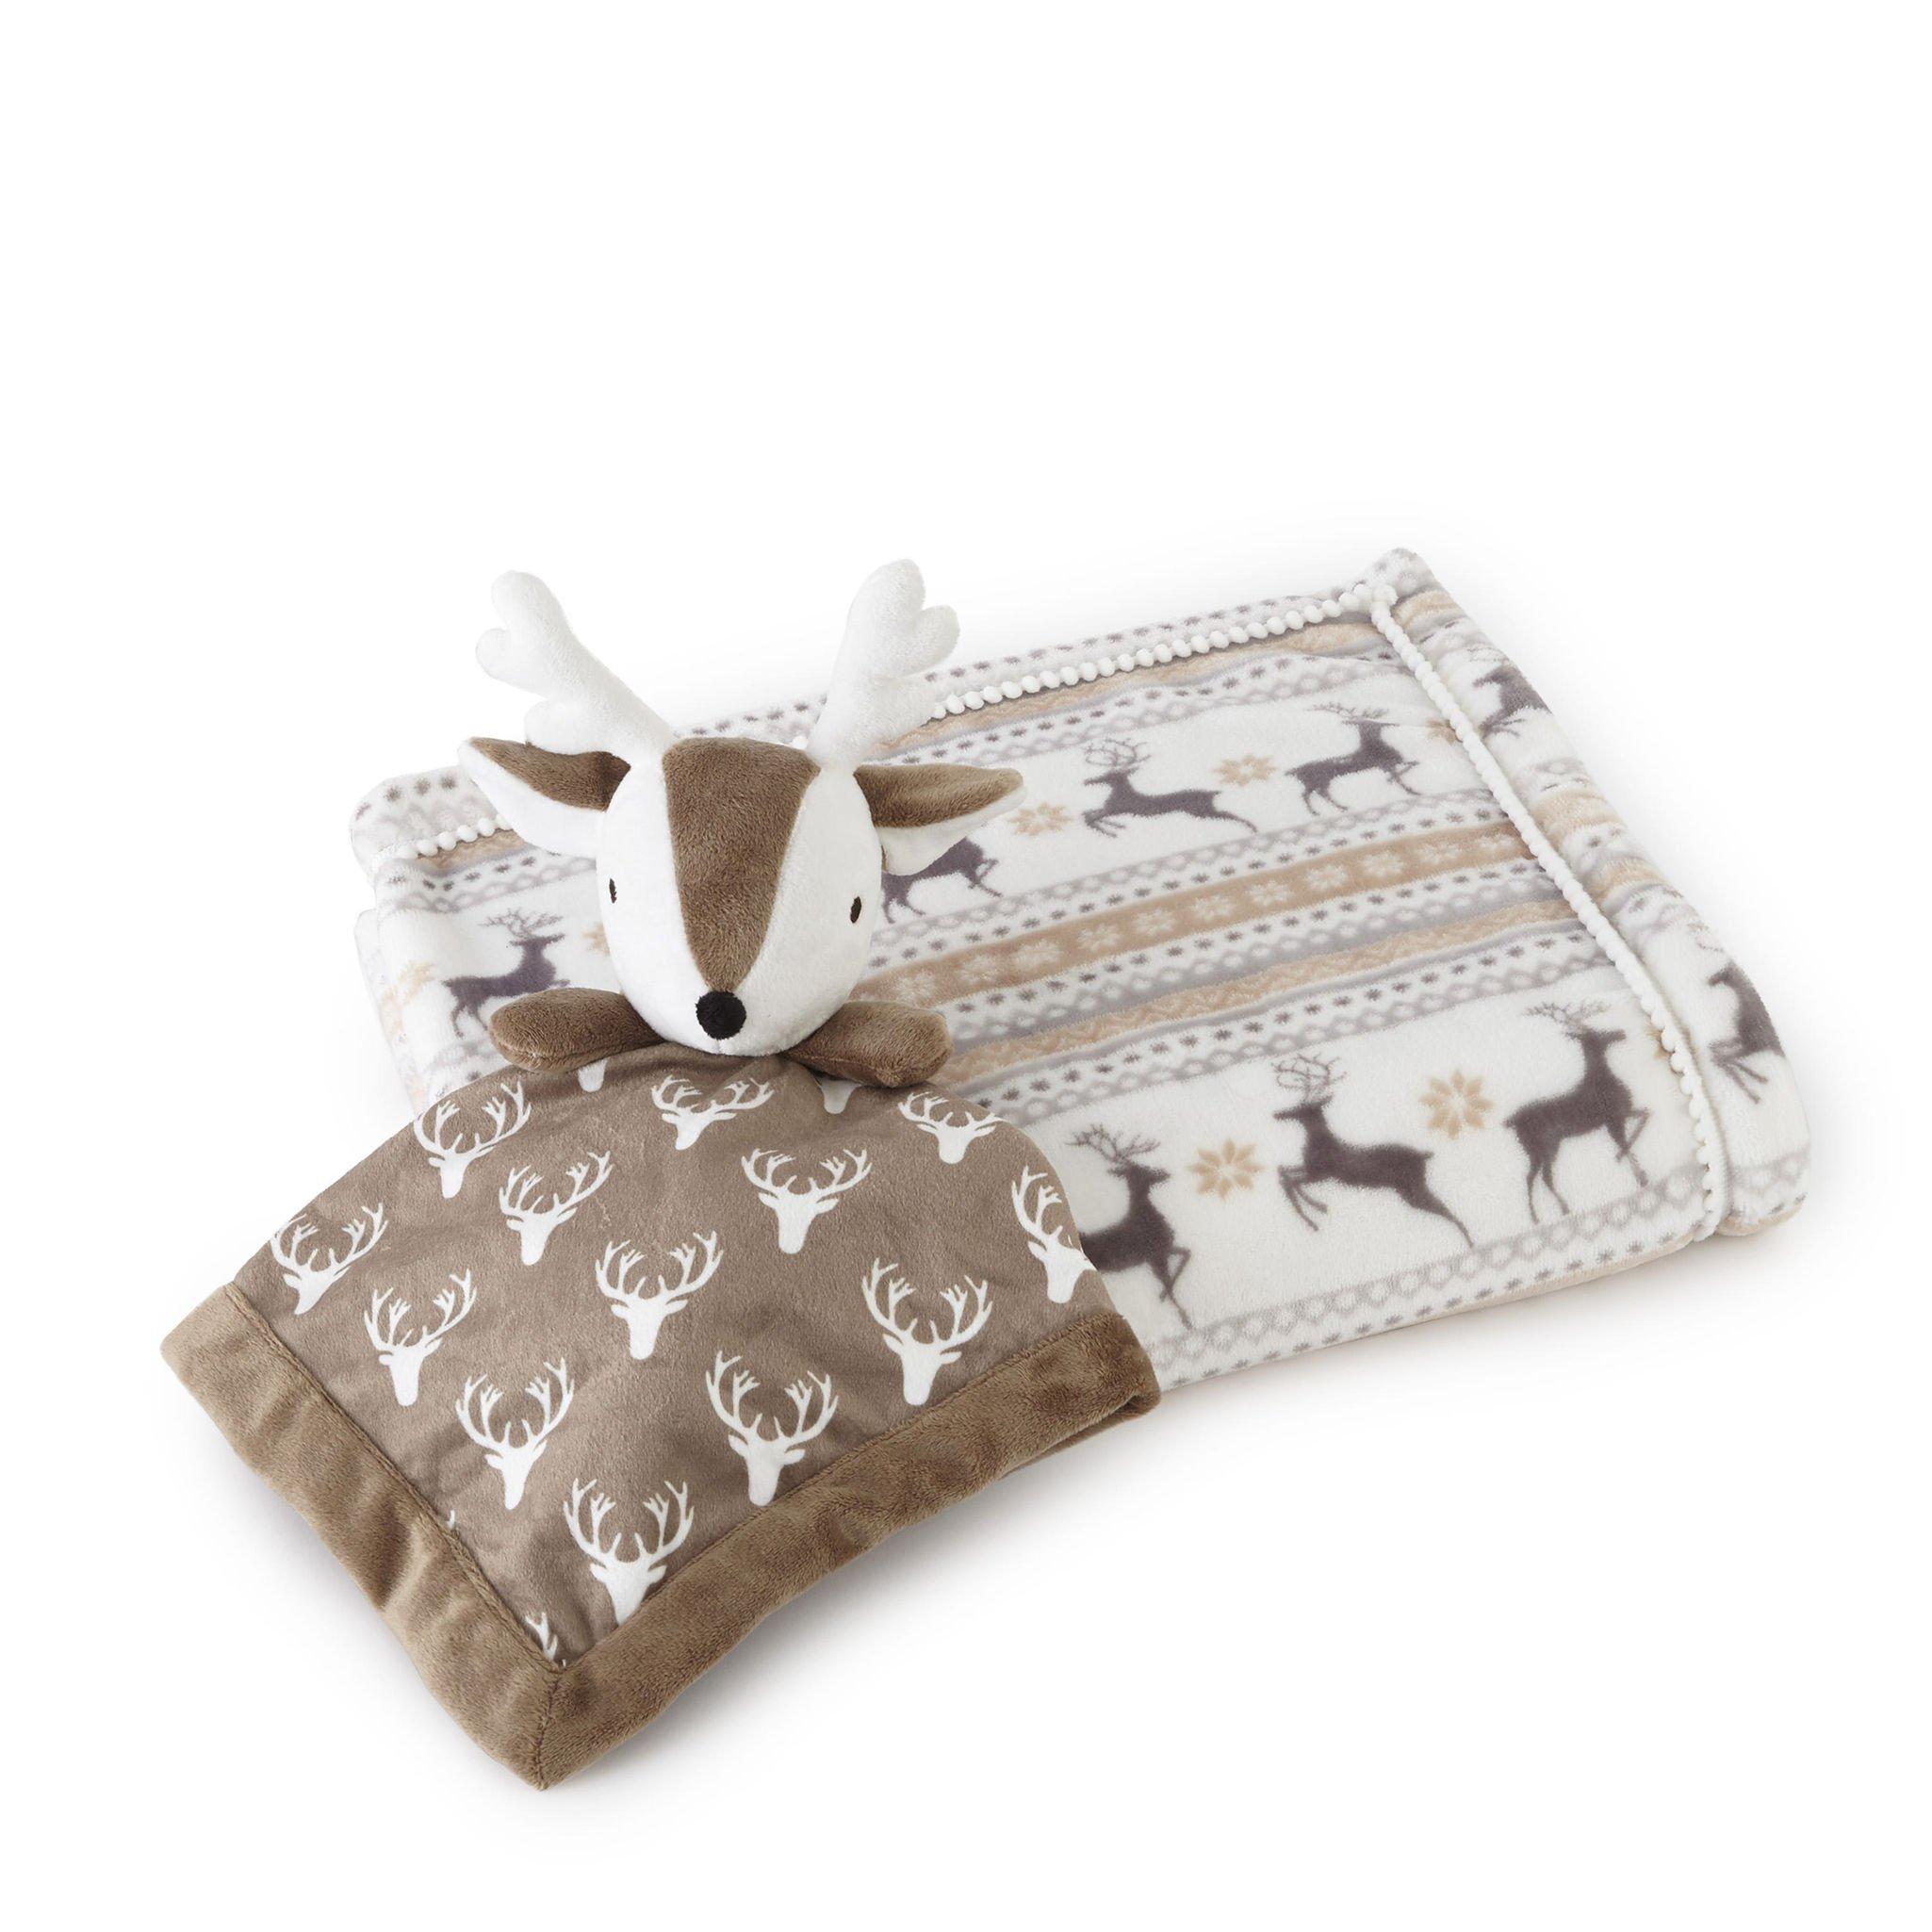 Levtex Baby Brown Plush Blanket with Deer Security Blanket Set